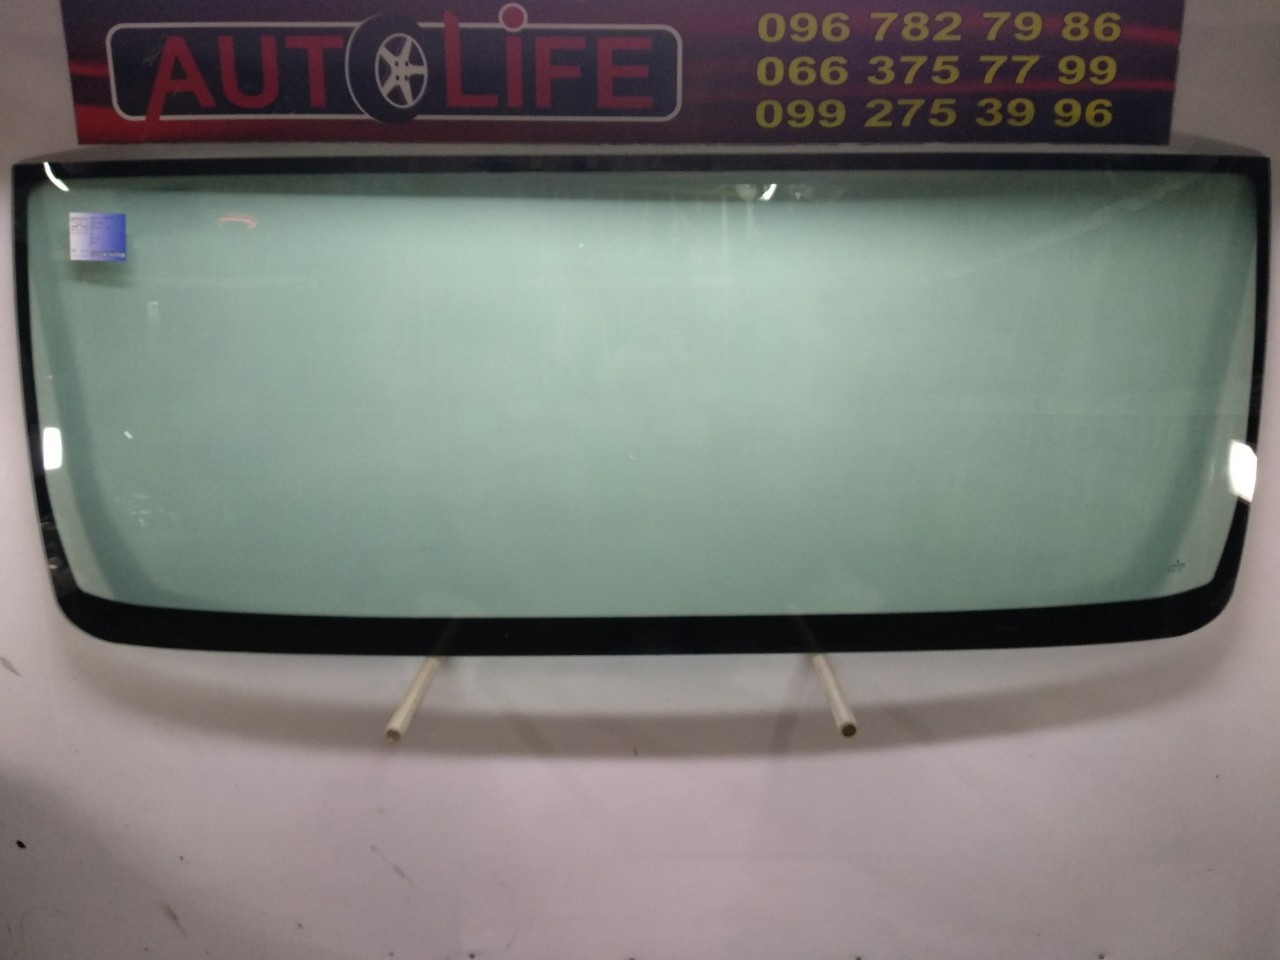 Лобовое стекло MAN TGA TreylerXL (Грузовик) (2000-2018)   Автостекло на тягач МАН ТГА   Лобове скло МАН ТГА